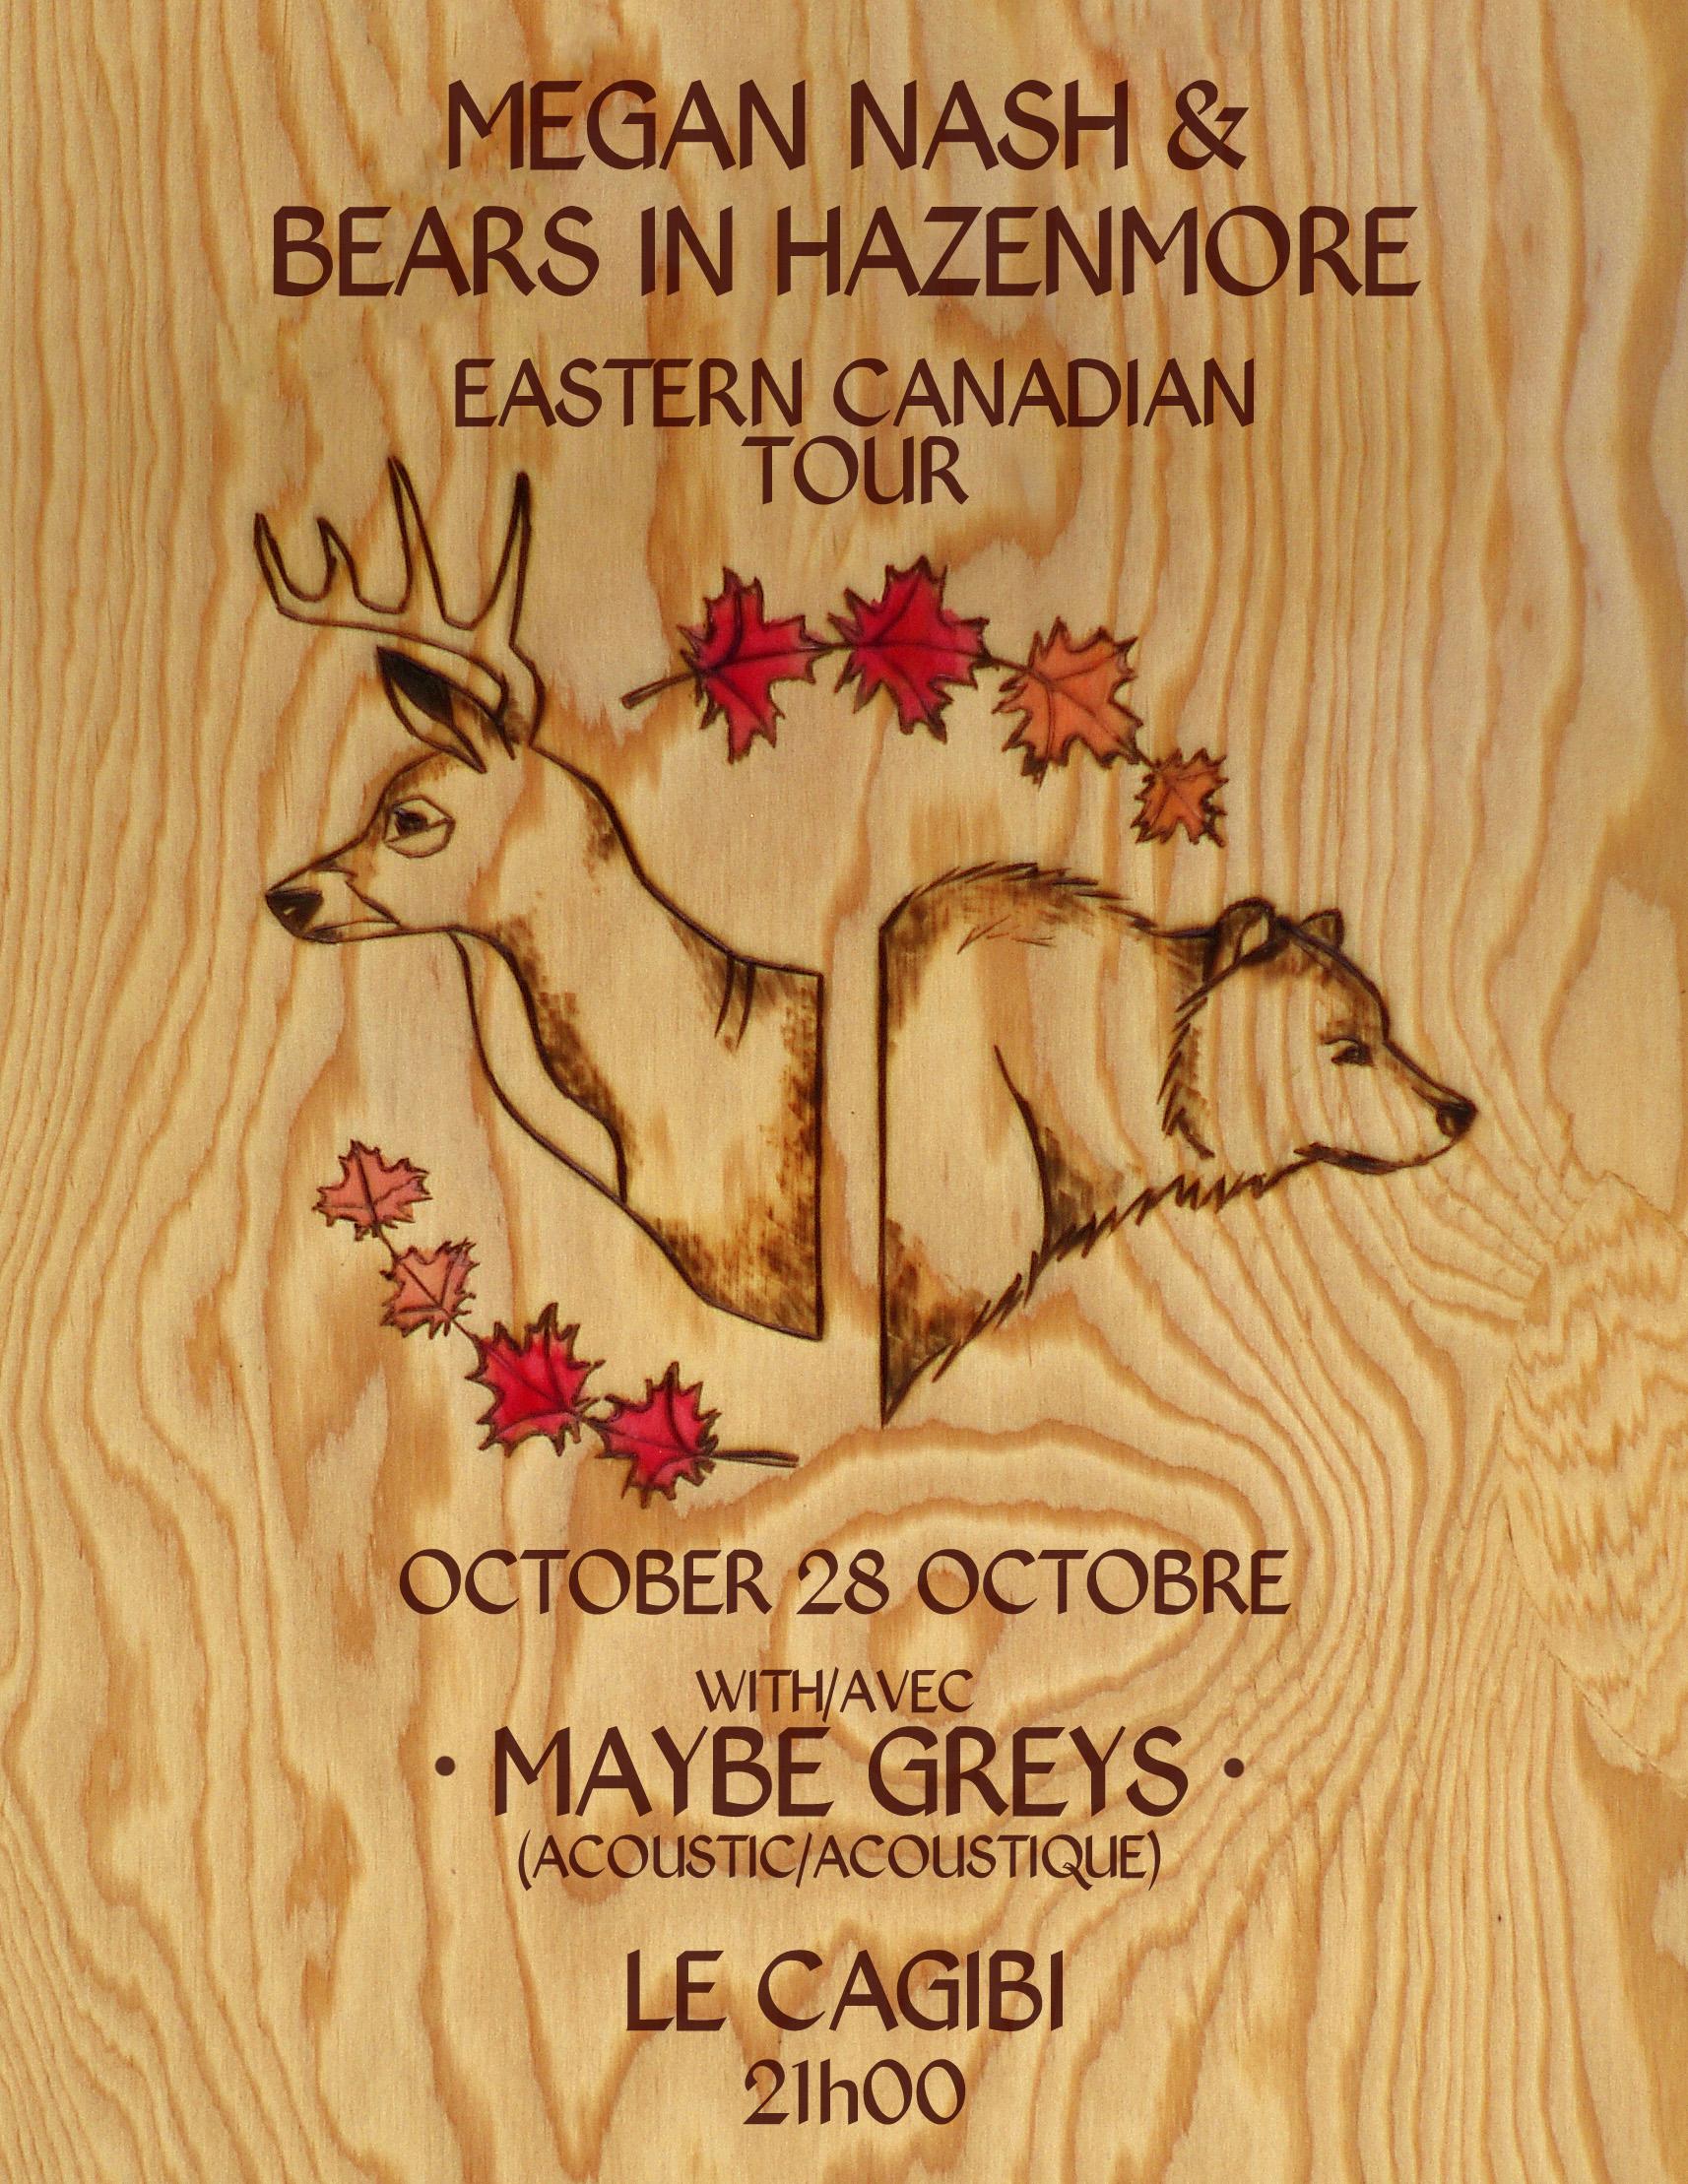 BiH/Nash Montreal Poster Oct 2016